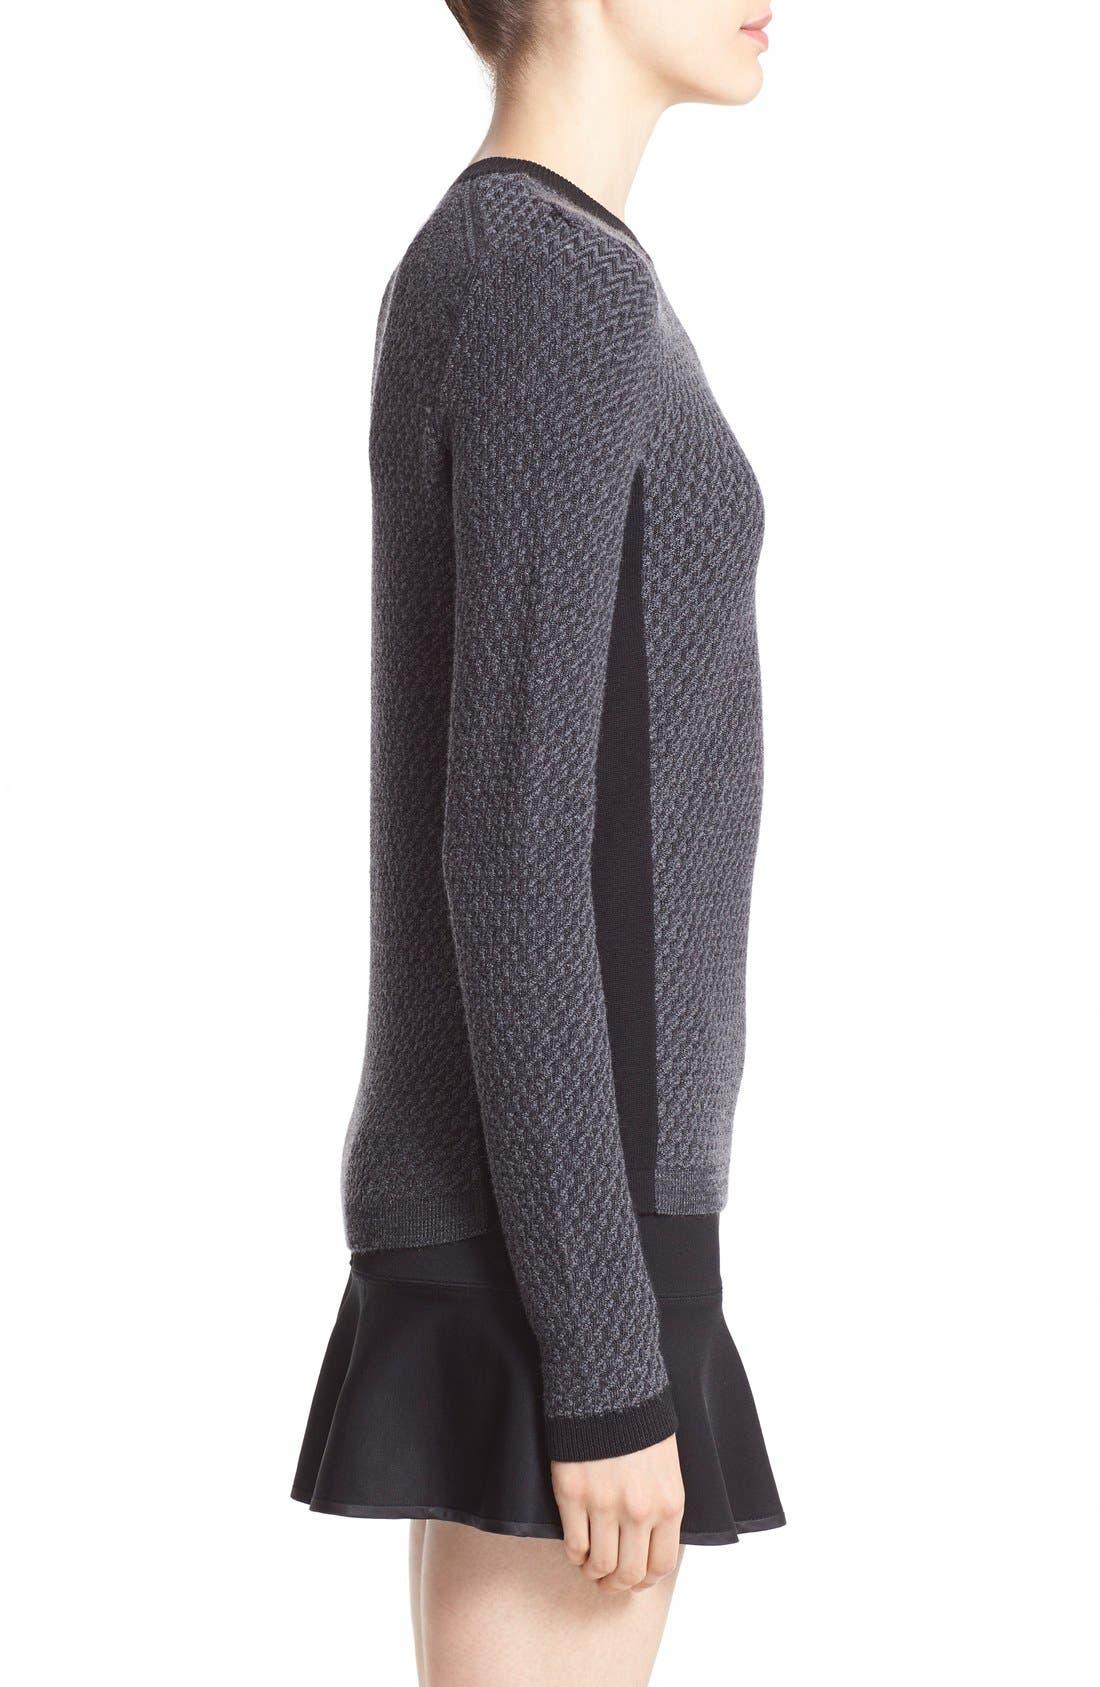 Alternate Image 3  - rag & bone 'Jaime' CrewneckSweater (Nordstrom Exclusive)